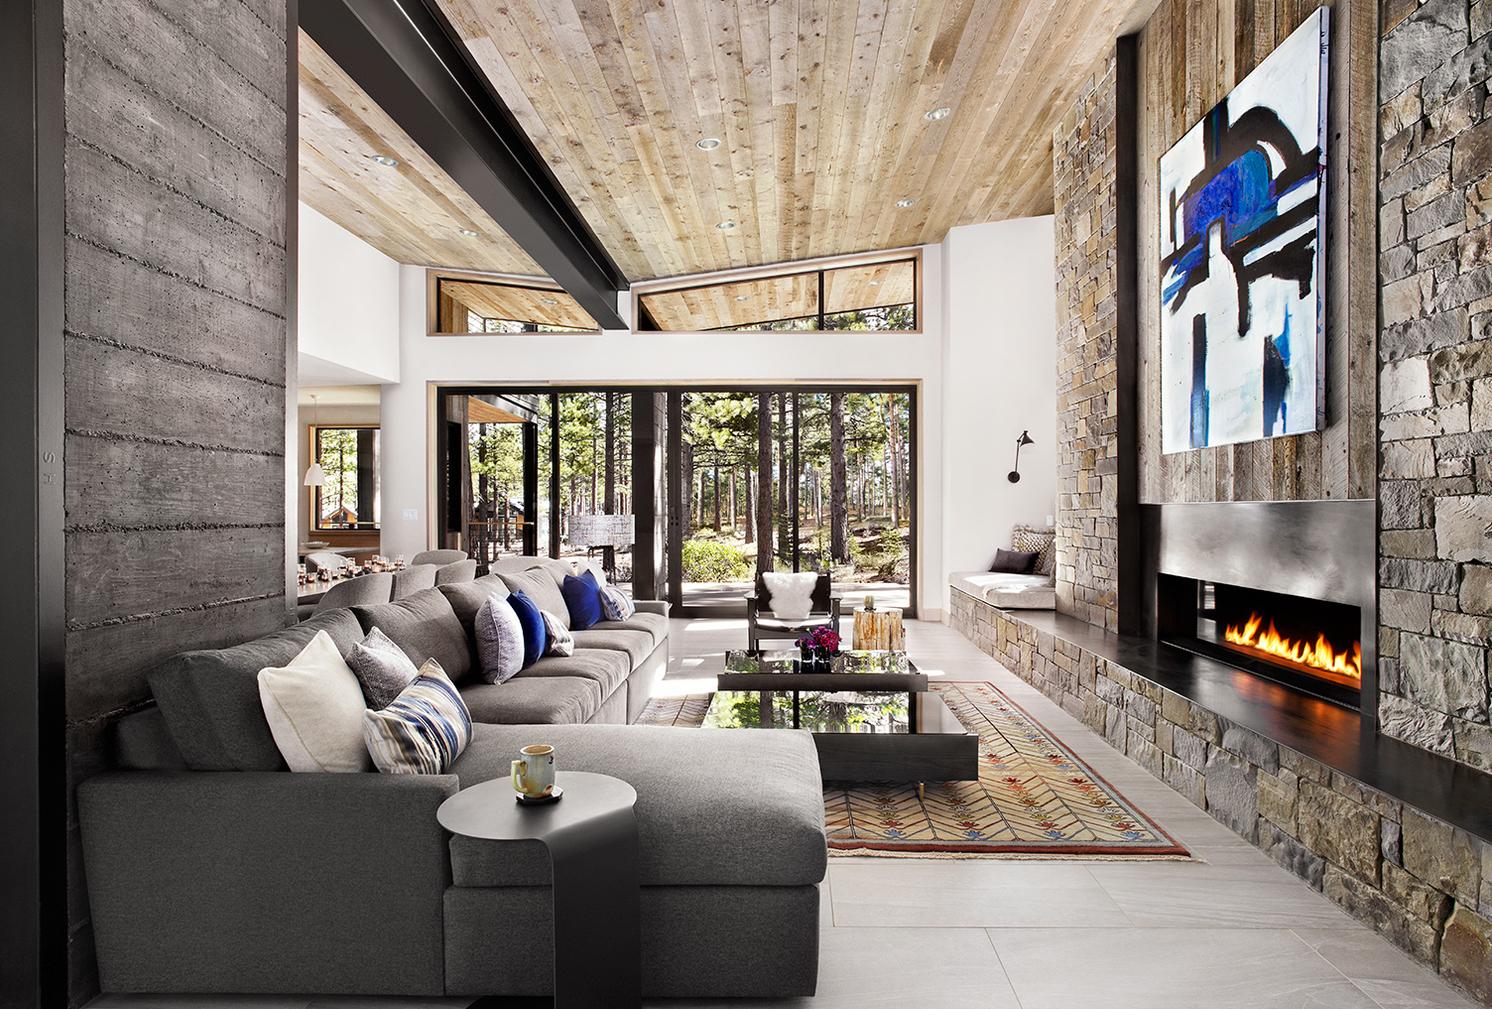 Tahoe Home, Interior Design Kris Foss | Artist: Joanne Fox